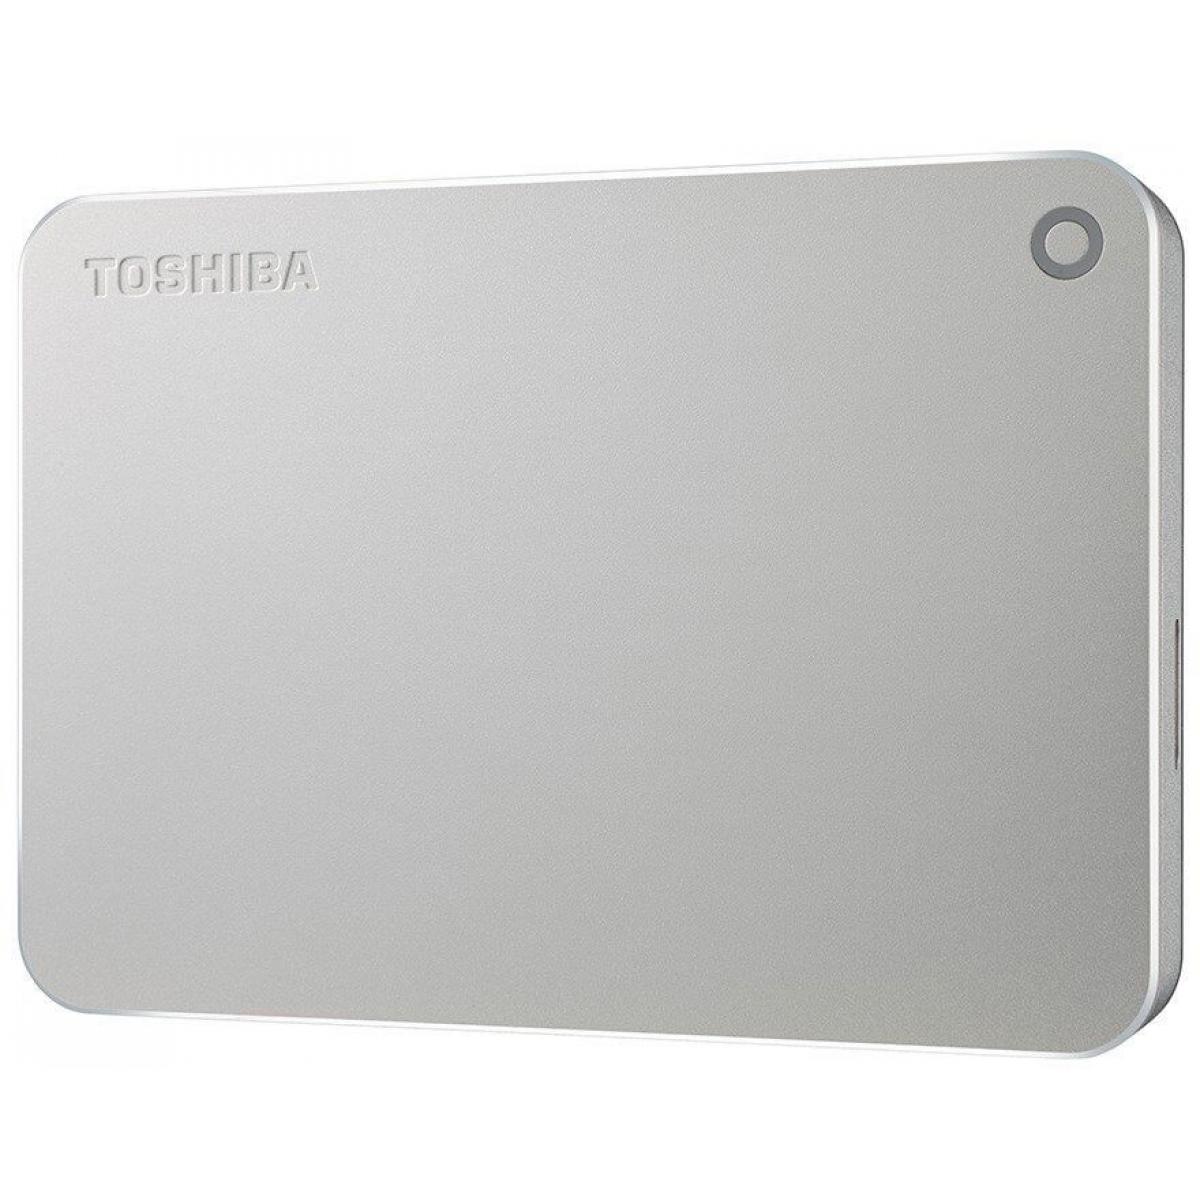 HD Externo Portátil Toshiba Canvio Premium 2TB HDTW120XC3C1 USB 3.0 Prata